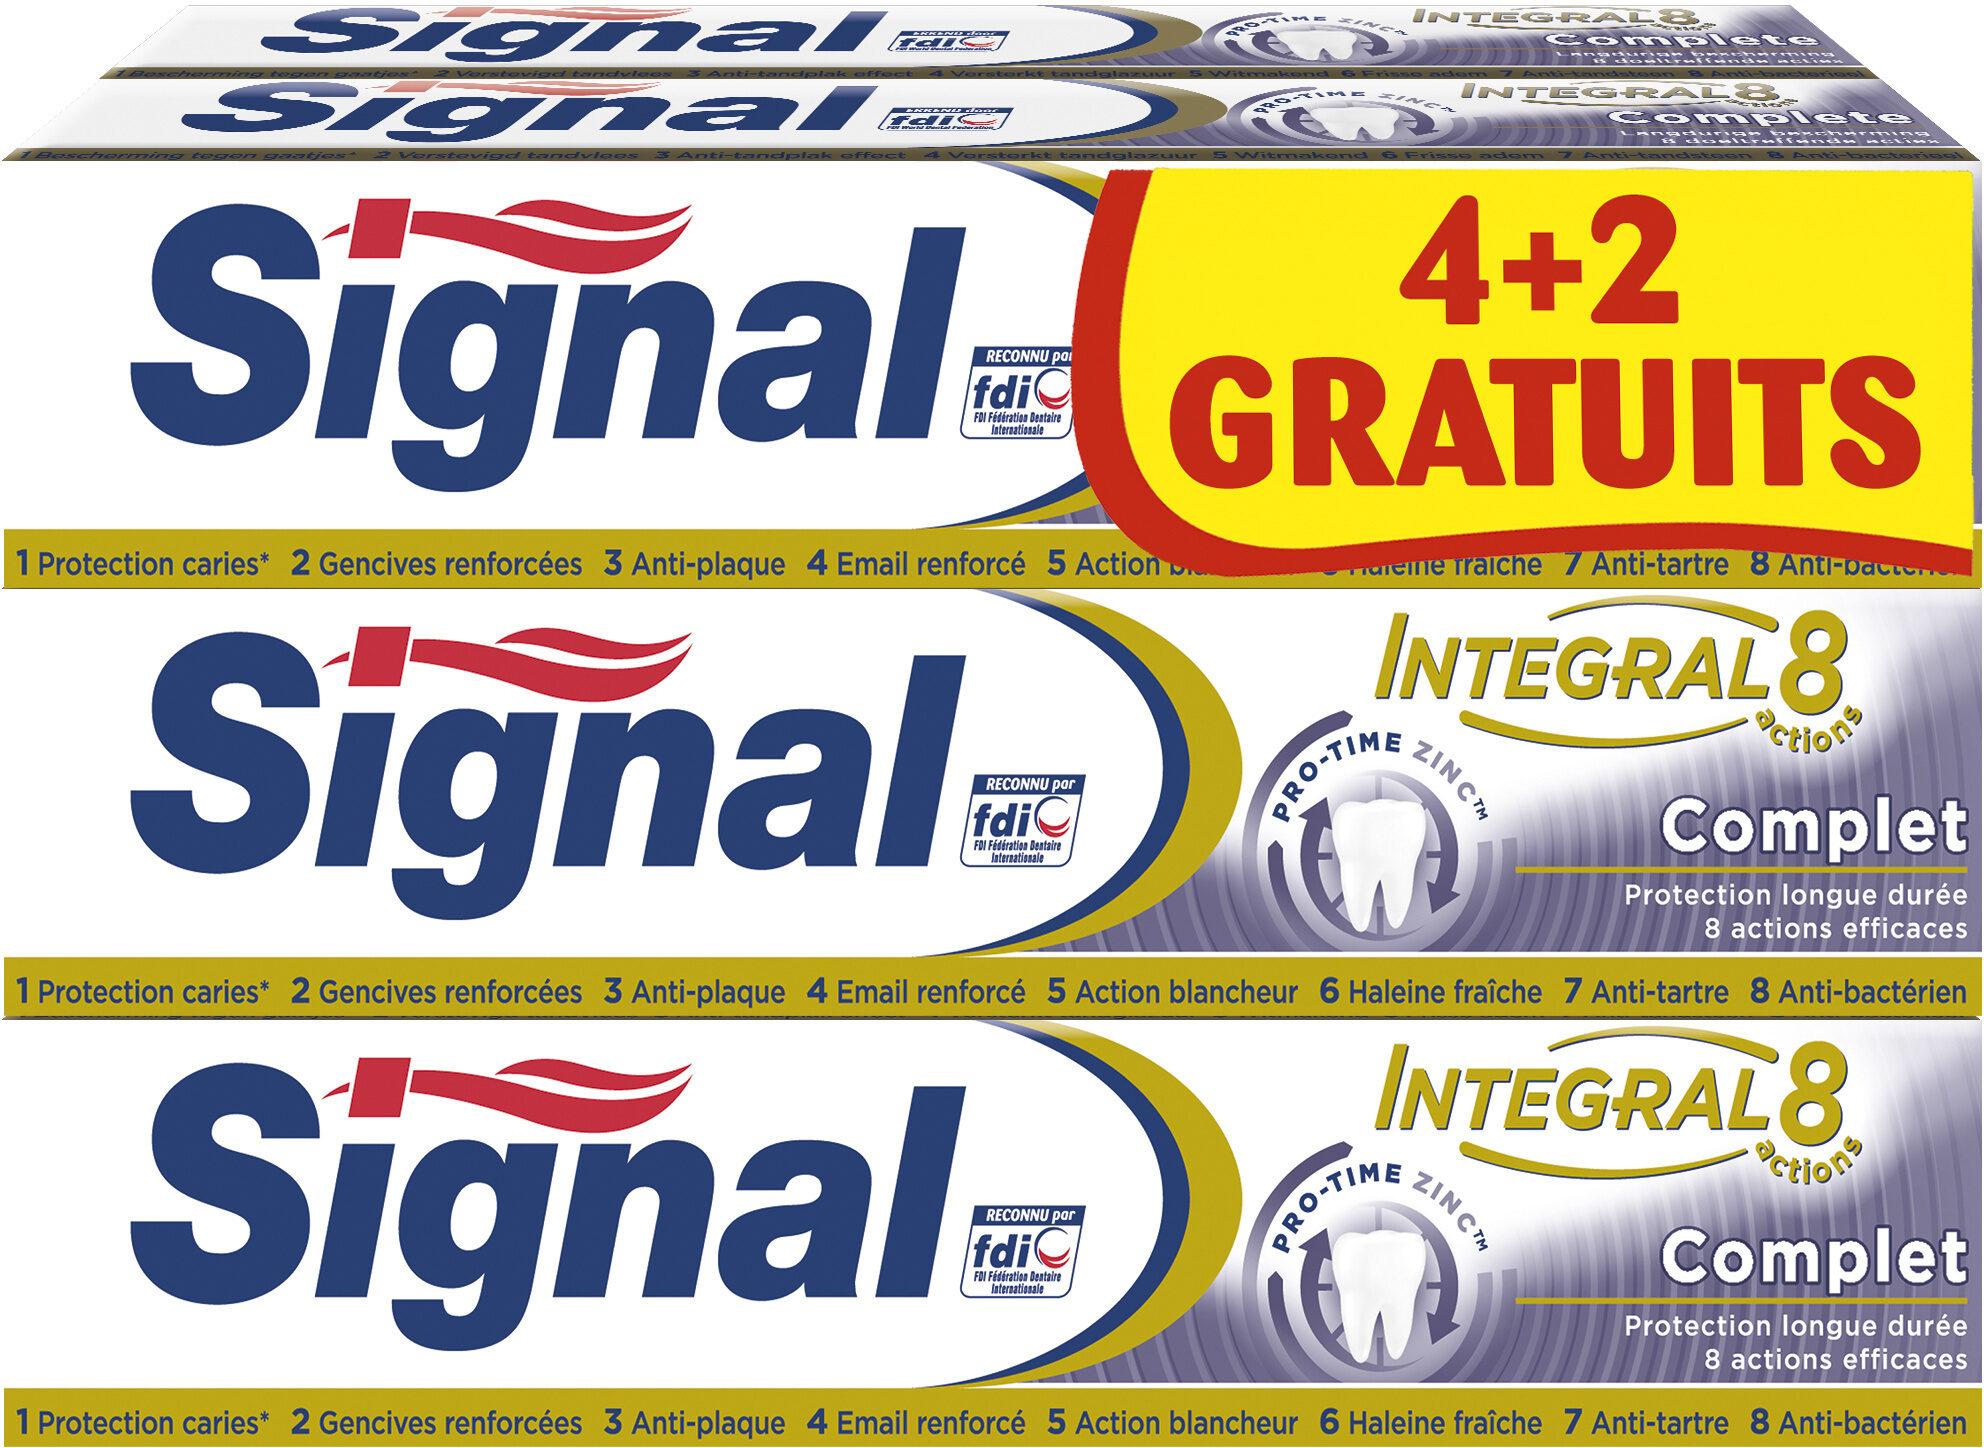 Signal Integral 8 Dentifrice Complet Tube Lot 4+2 Offerts x 75ml - Produit - fr